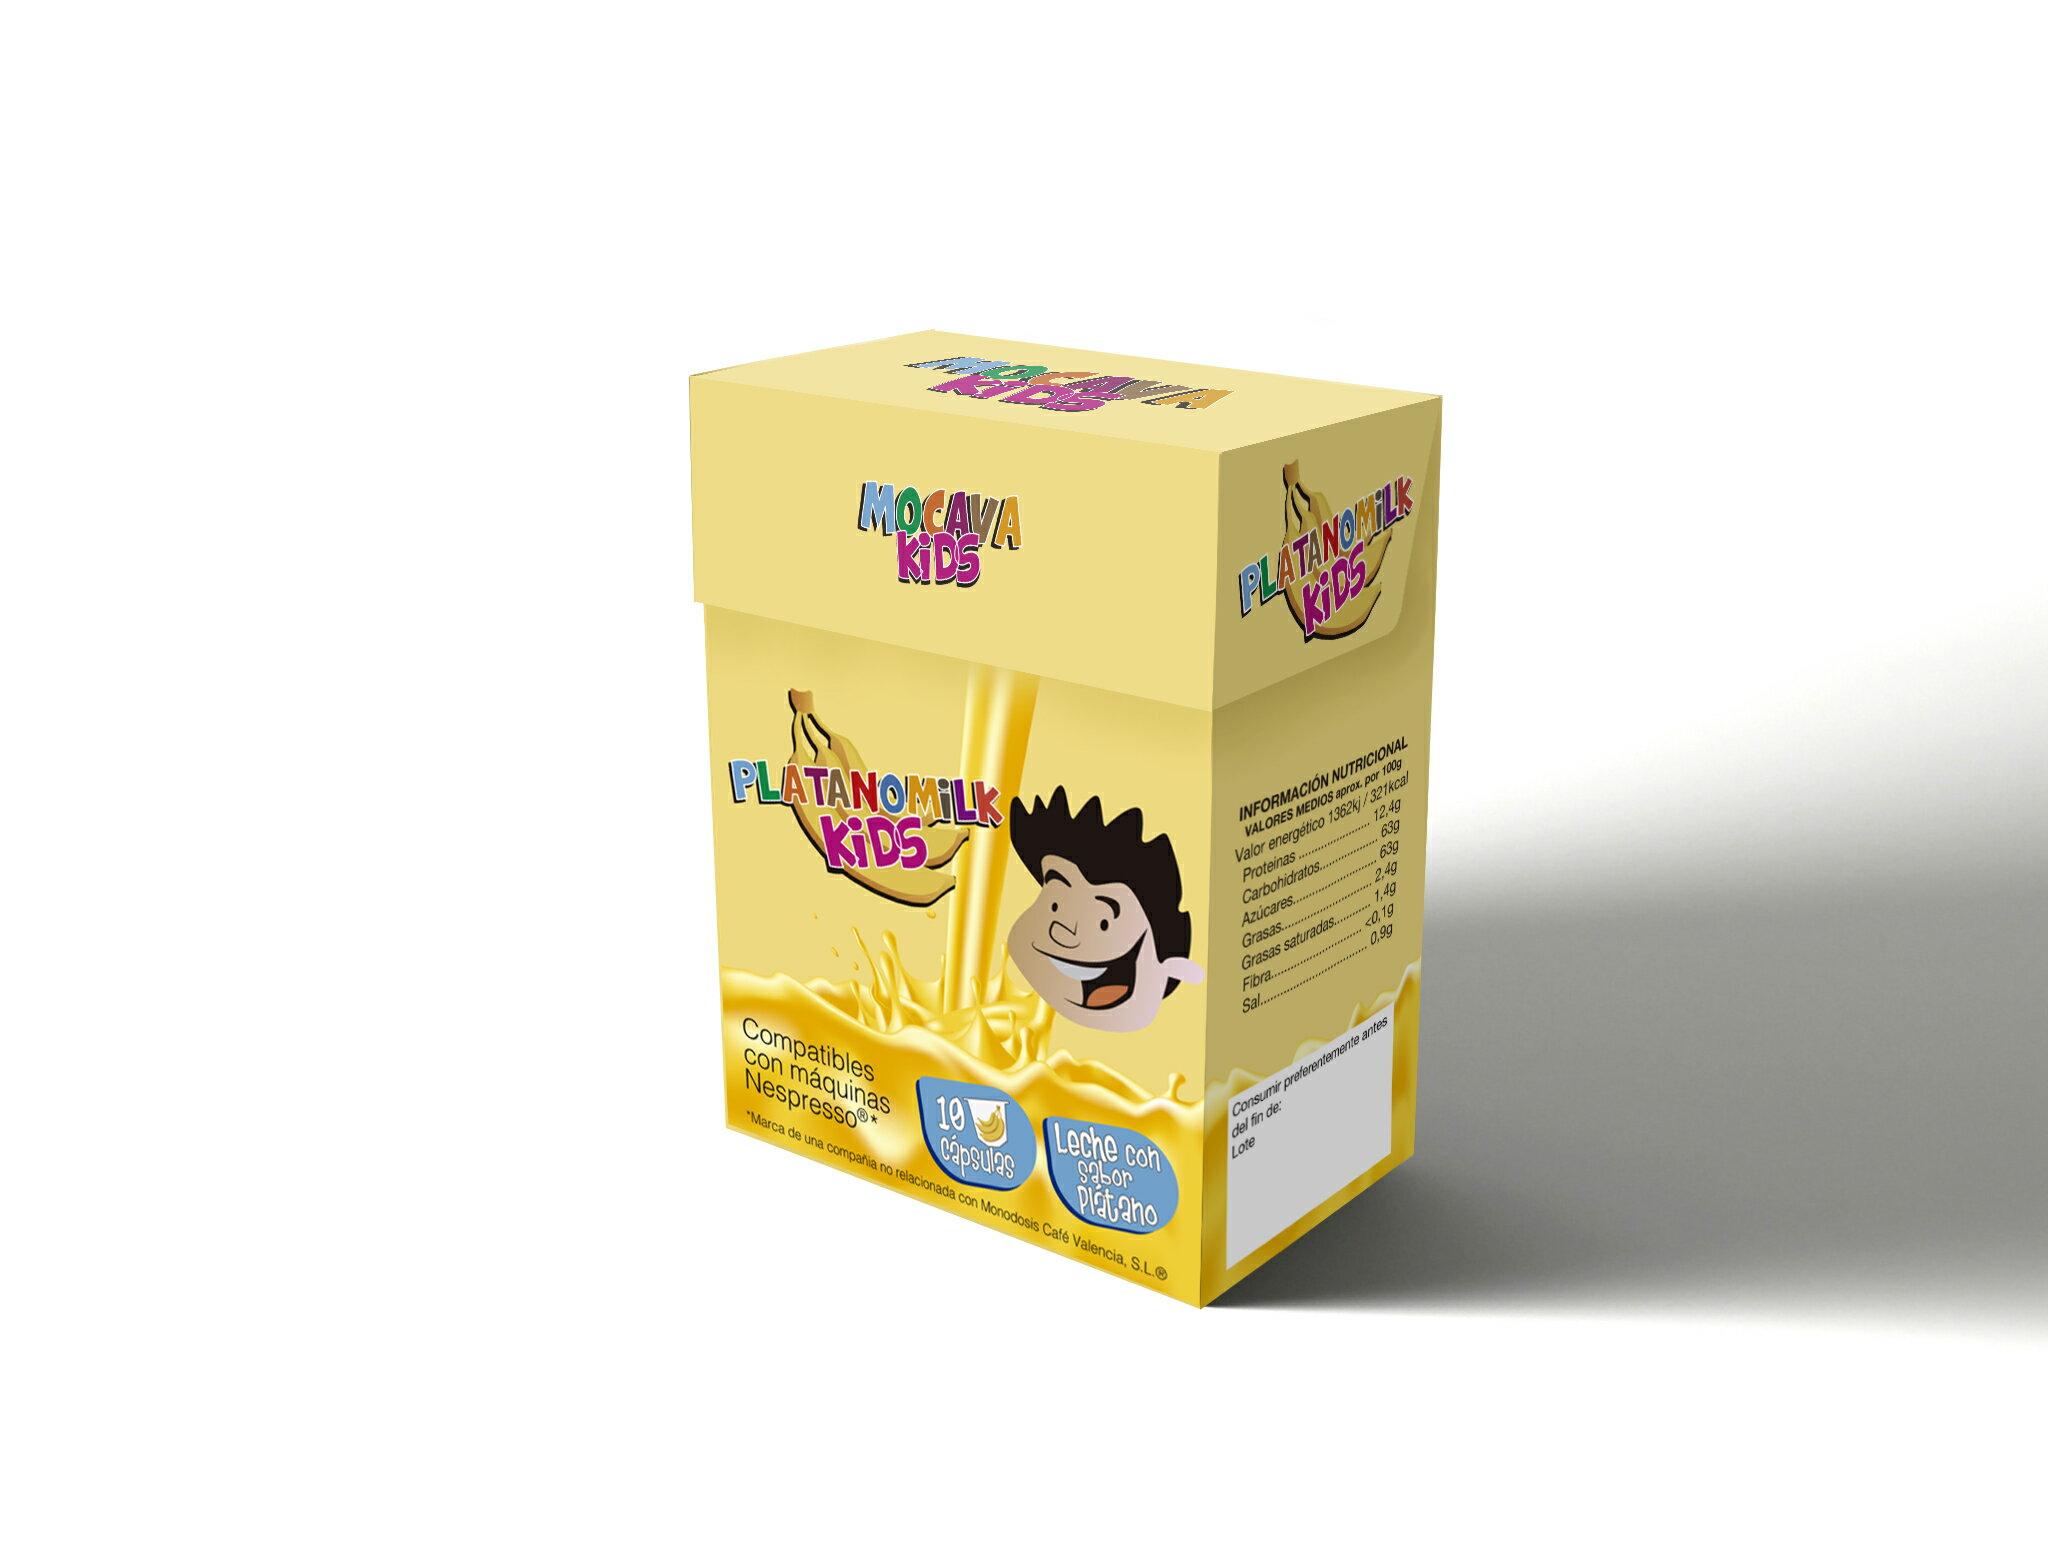 Pack 120 cápsulas PLATANO MILK KIDS compatibles con Nespresso 0